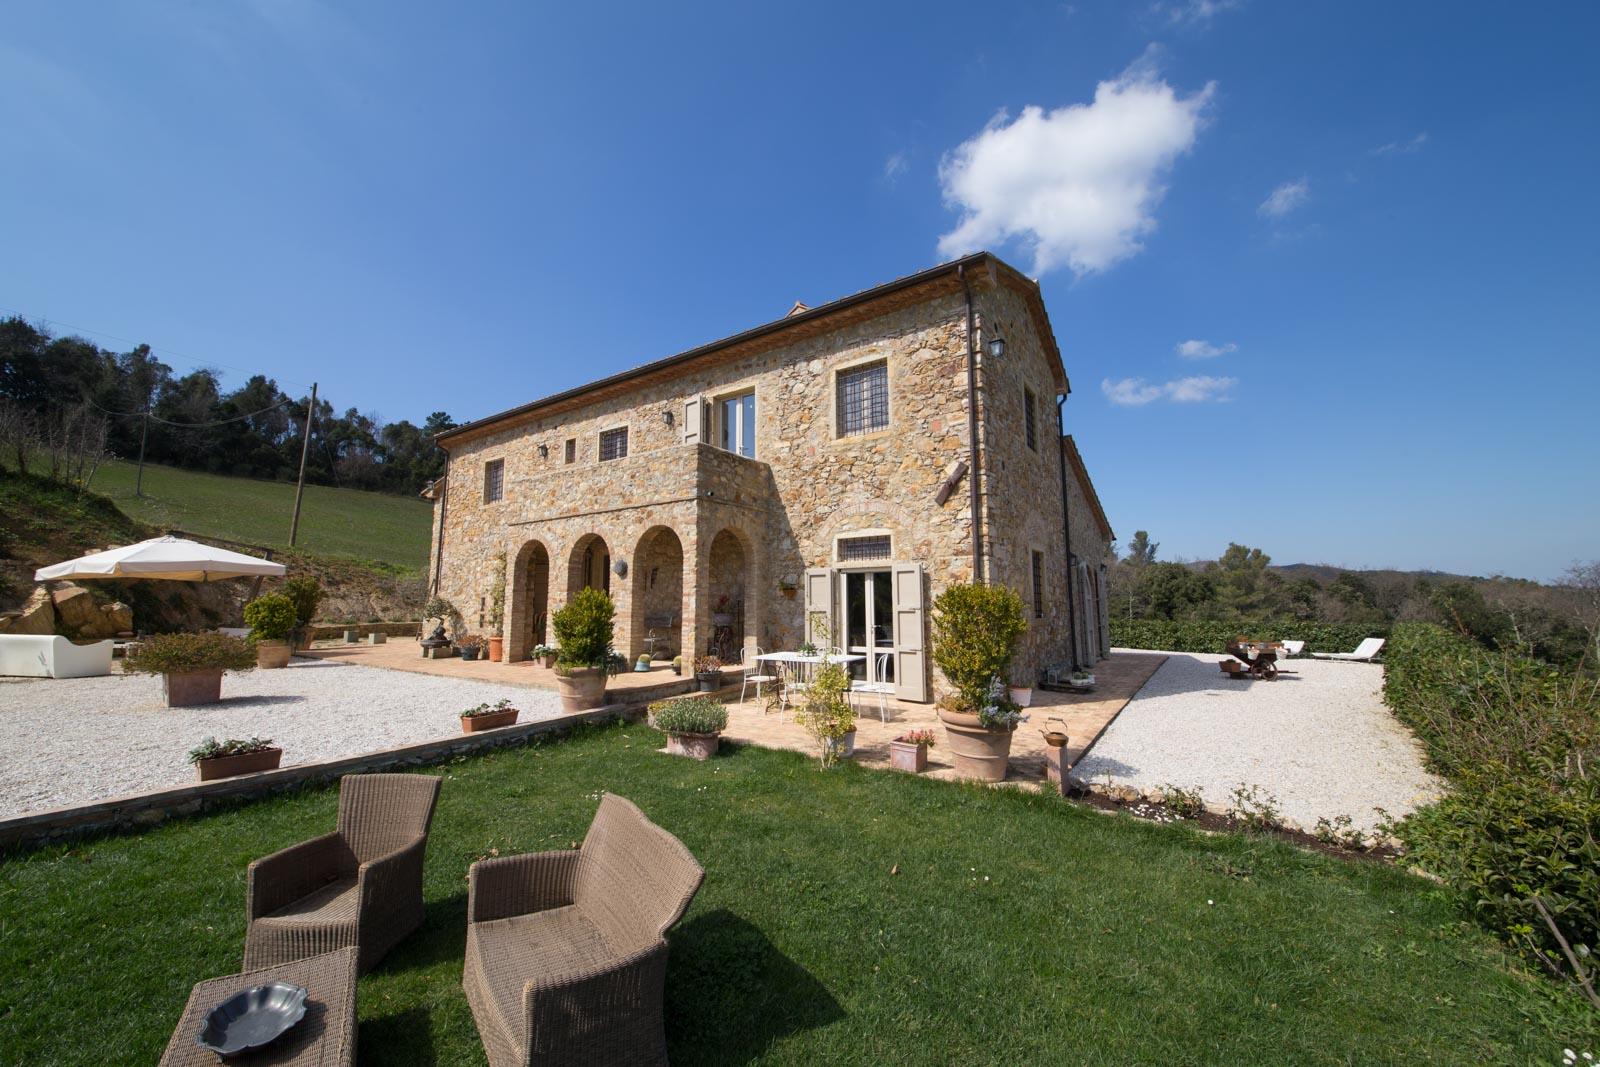 Landsitz kaufen verkaufen in italien toskana livorno for Due case di mattoni storia